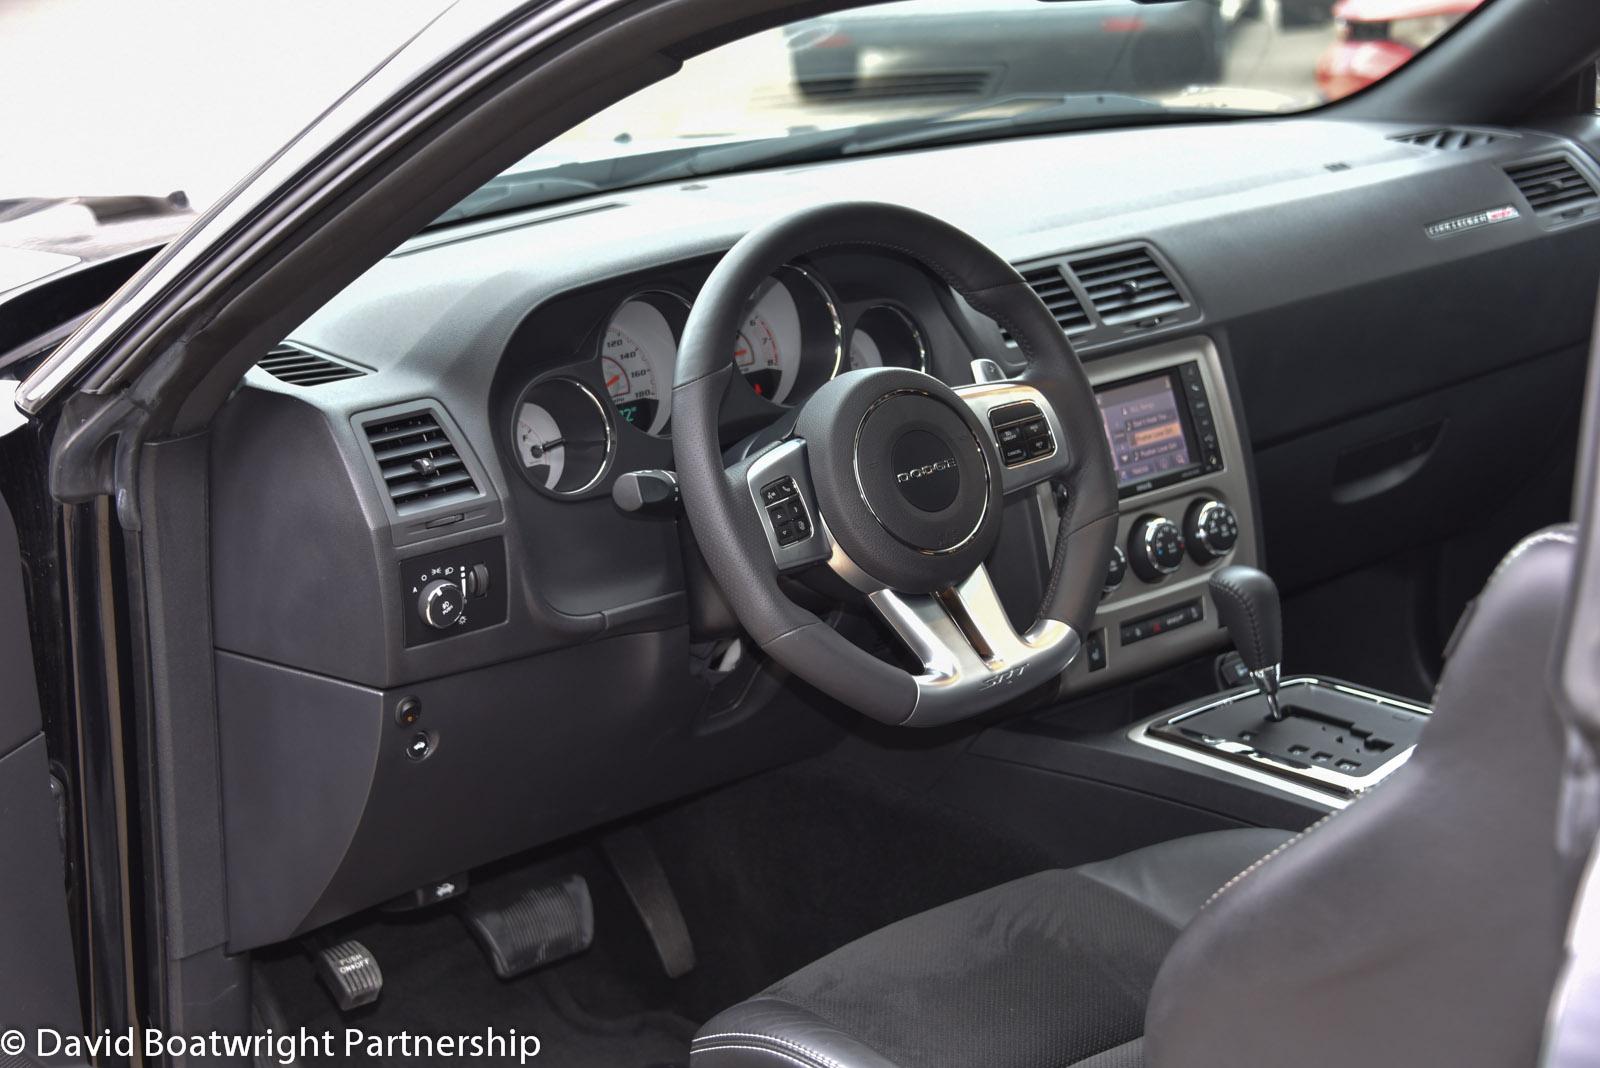 2014 Dodge Challenger Srt8 392 Auto 15 000 Miles David Boatwright Partnership Official Dodge Ram Dealers